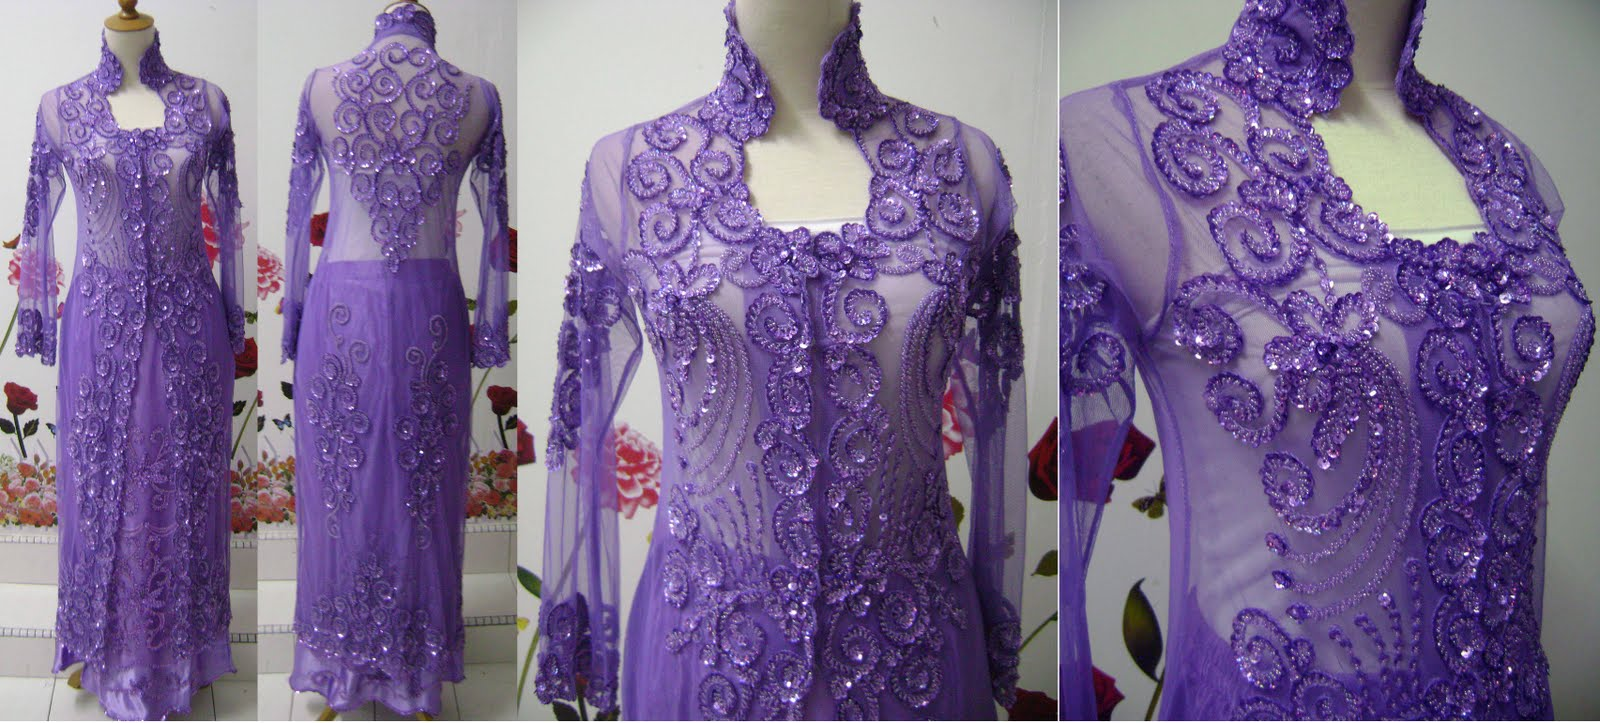 BAJU PENGANTIN KEBAYA SULAM WEDDING DRESS KEBAYA LABUH